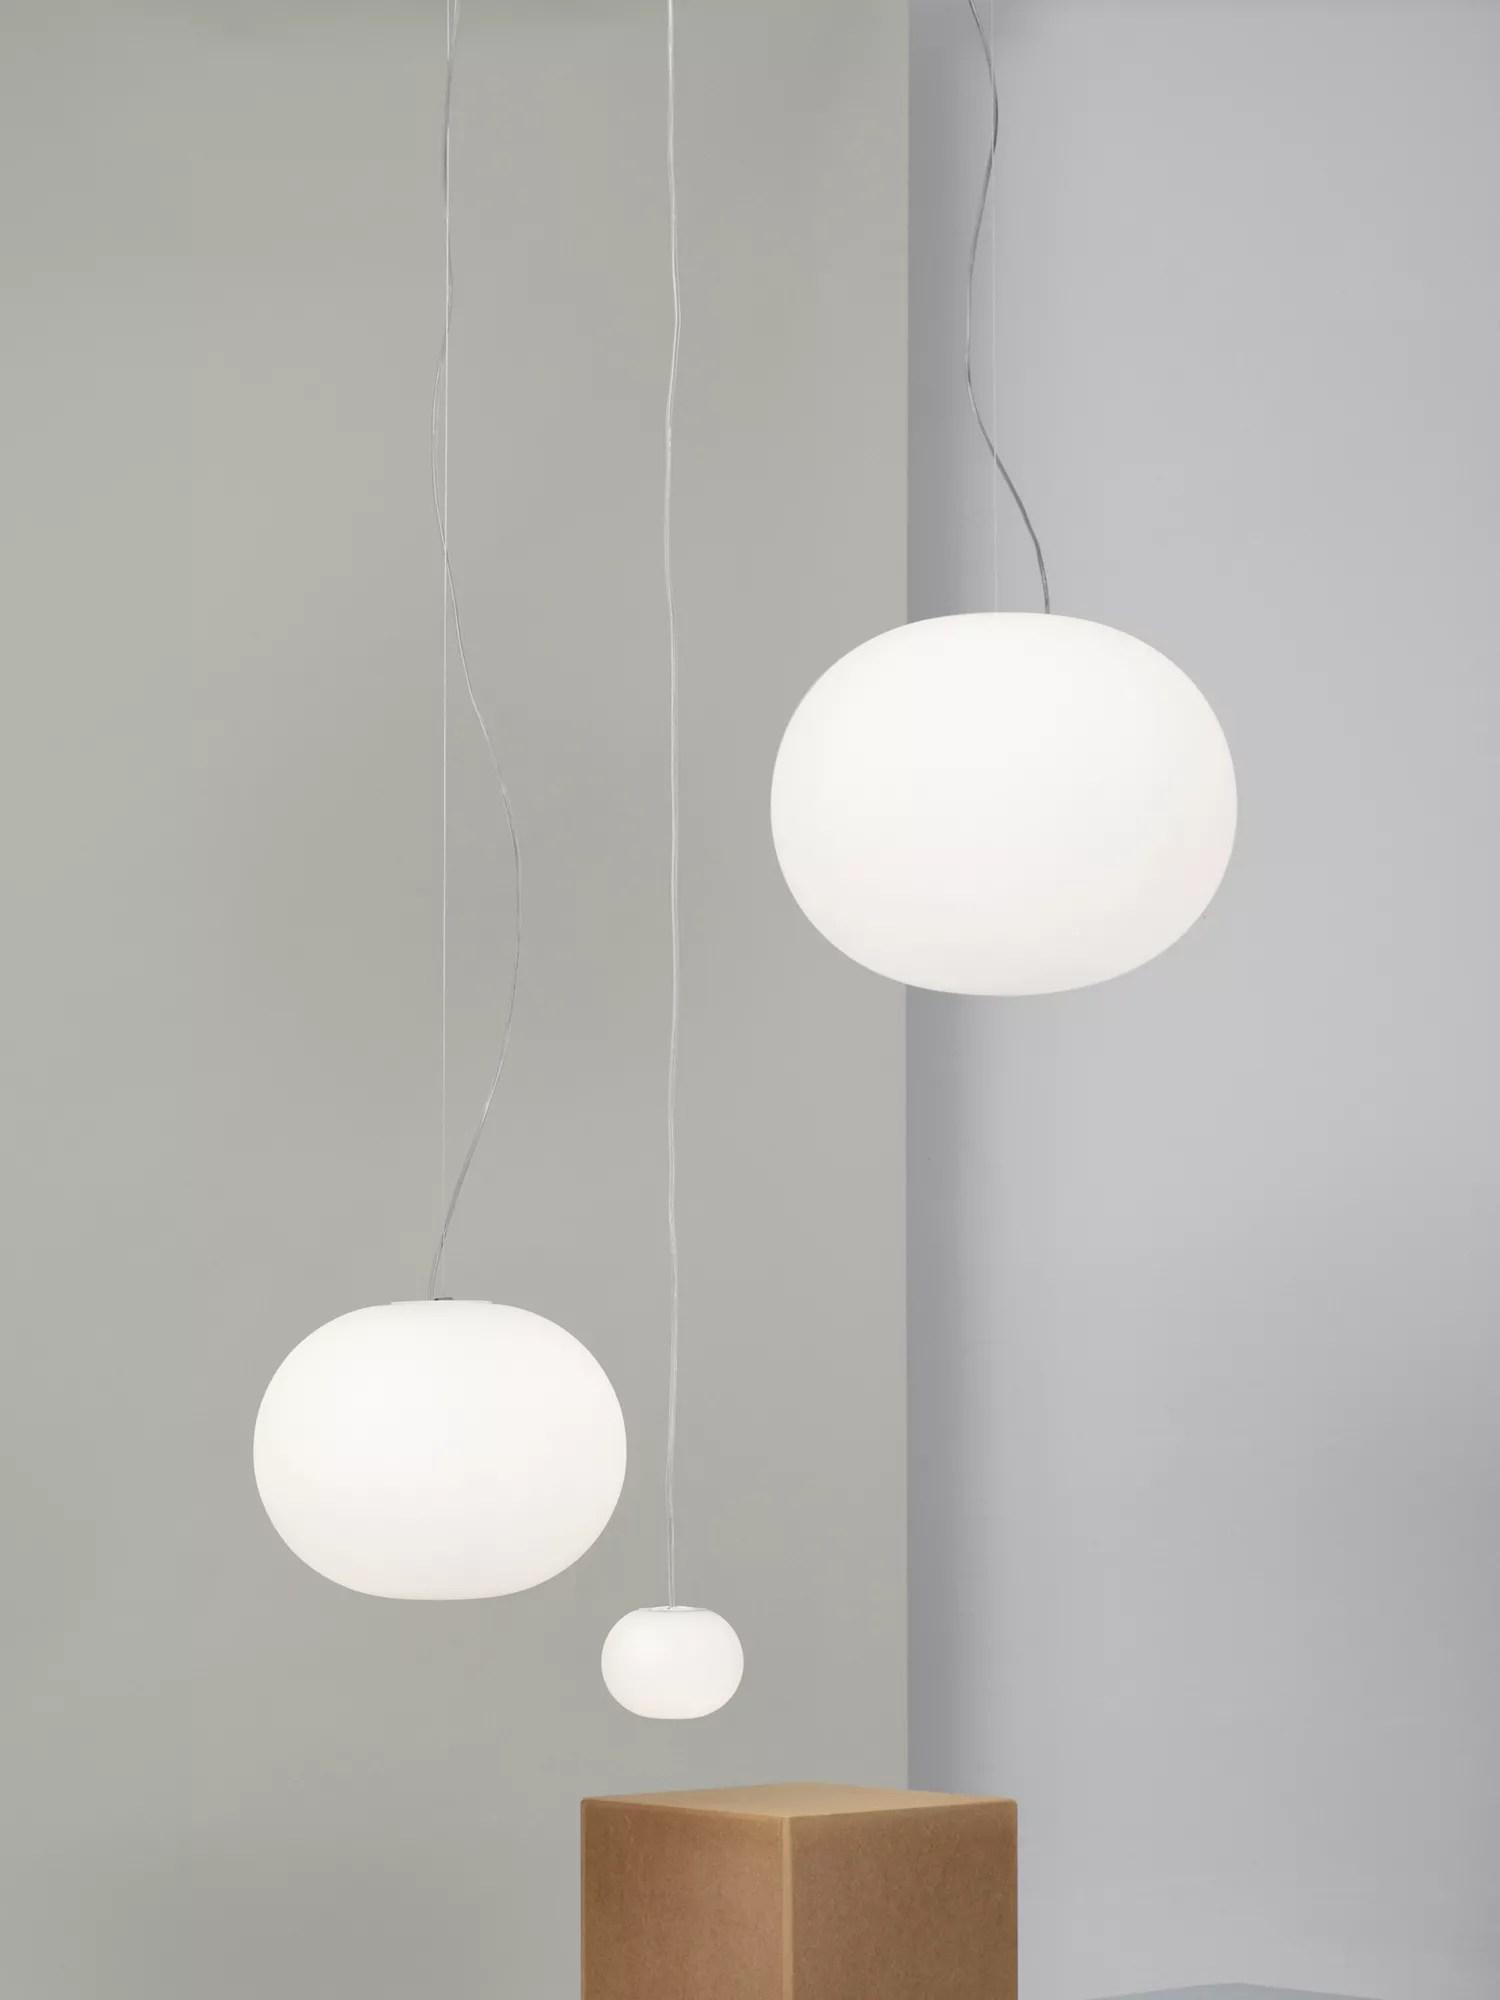 Flos Glo Ball S2 Ceiling Light, White at John Lewis & Partners